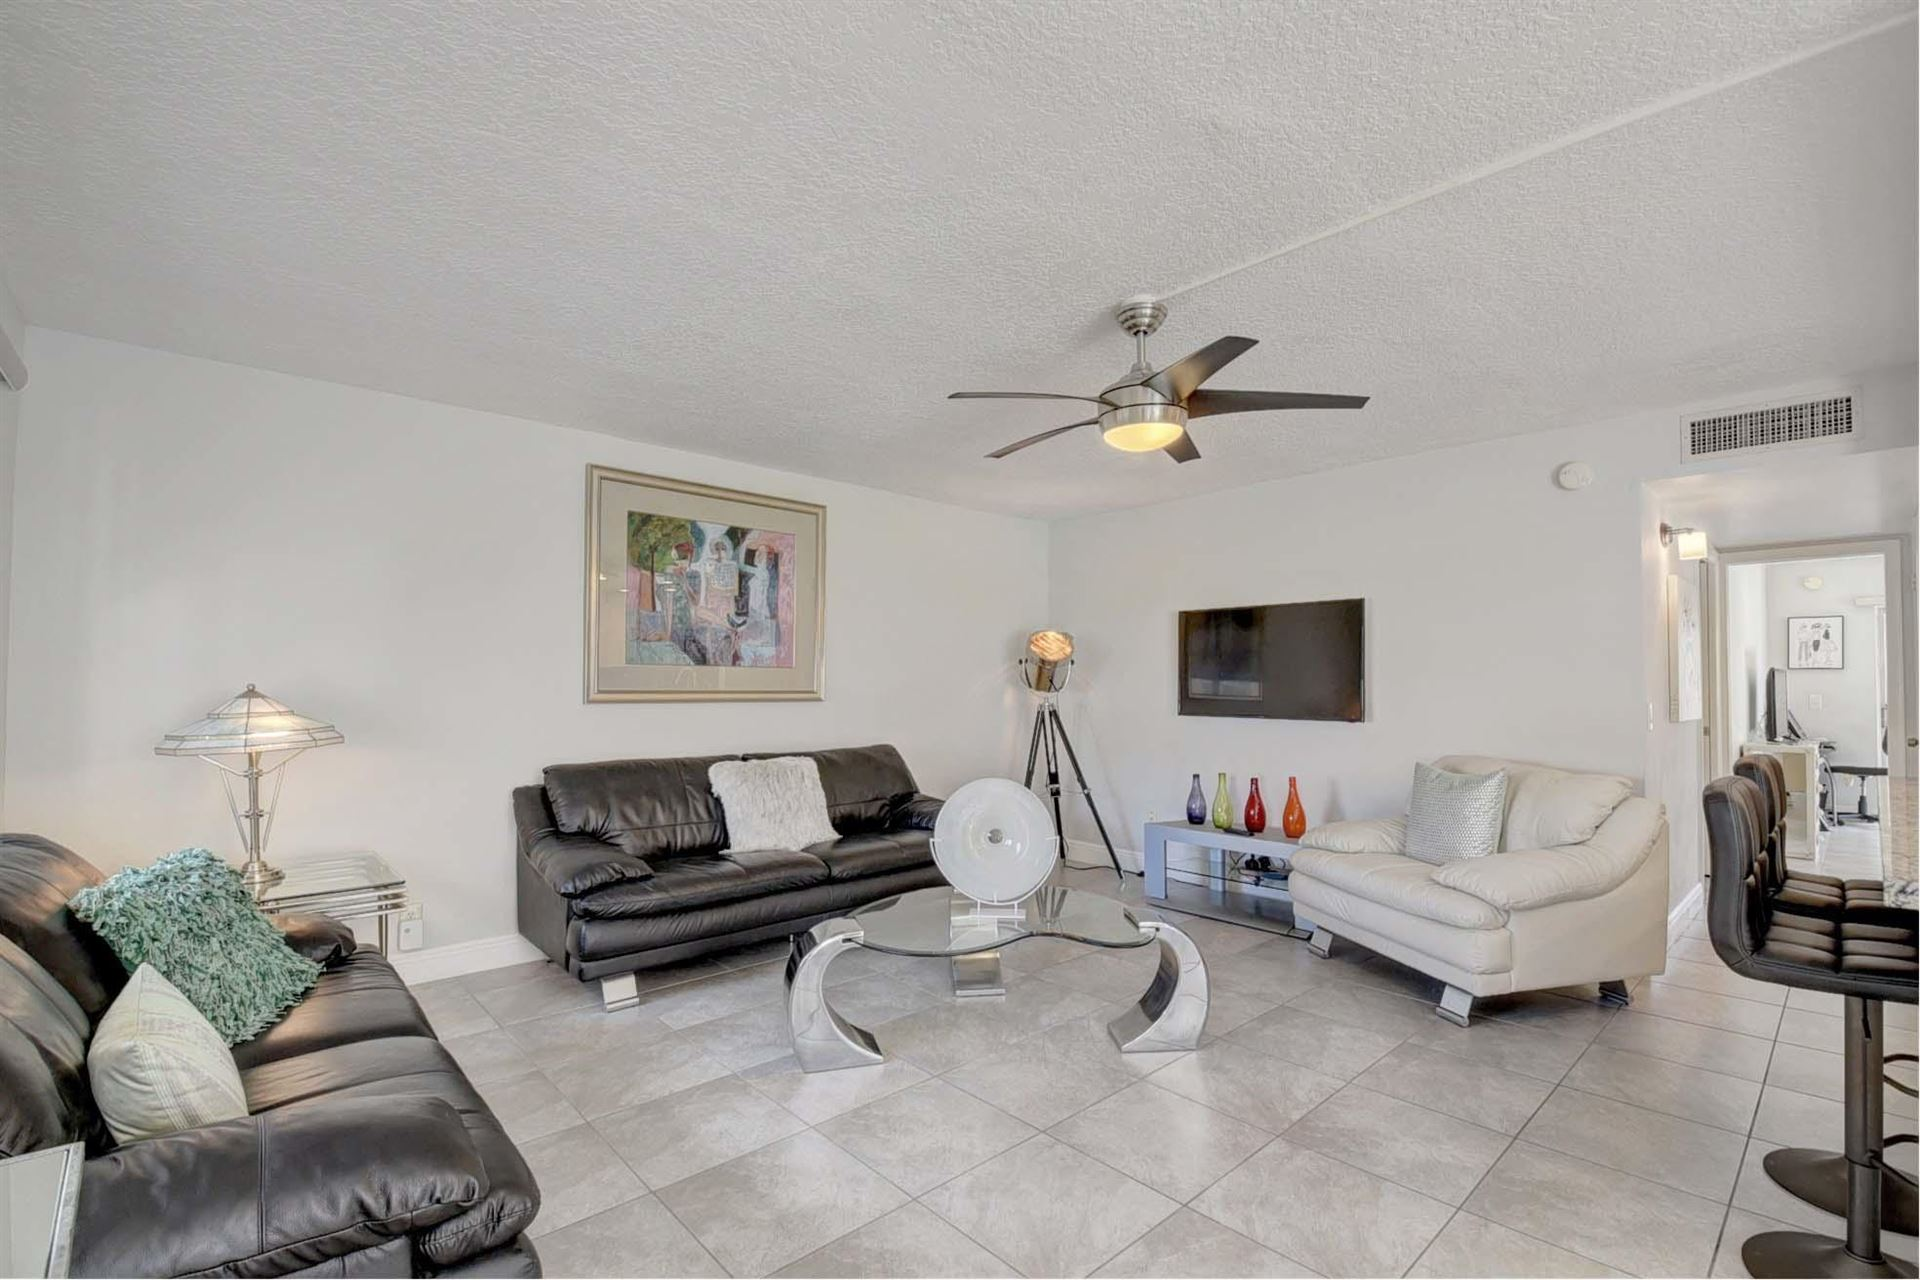 Photo of 150 Burgundy D, Delray Beach, FL 33484 (MLS # RX-10695214)